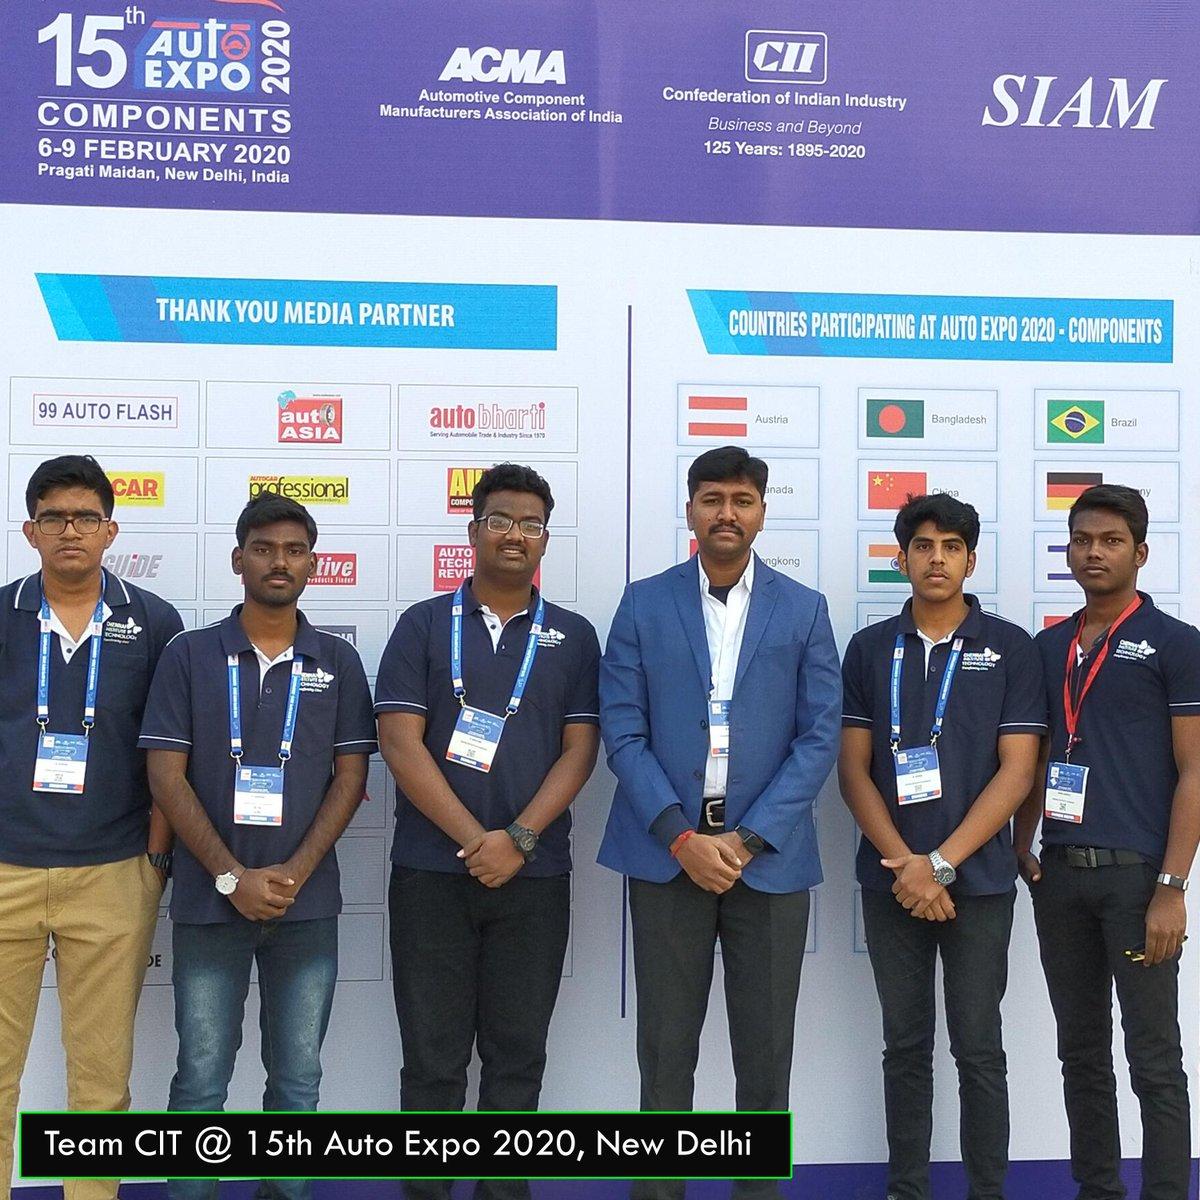 CITians @ Autoexpo 2020, NewDelhi #CITChennai #ChennaiInstituteOfTechnology #Autoexpo #IndustryConnectedInstitutepic.twitter.com/RhqhPV41Ar